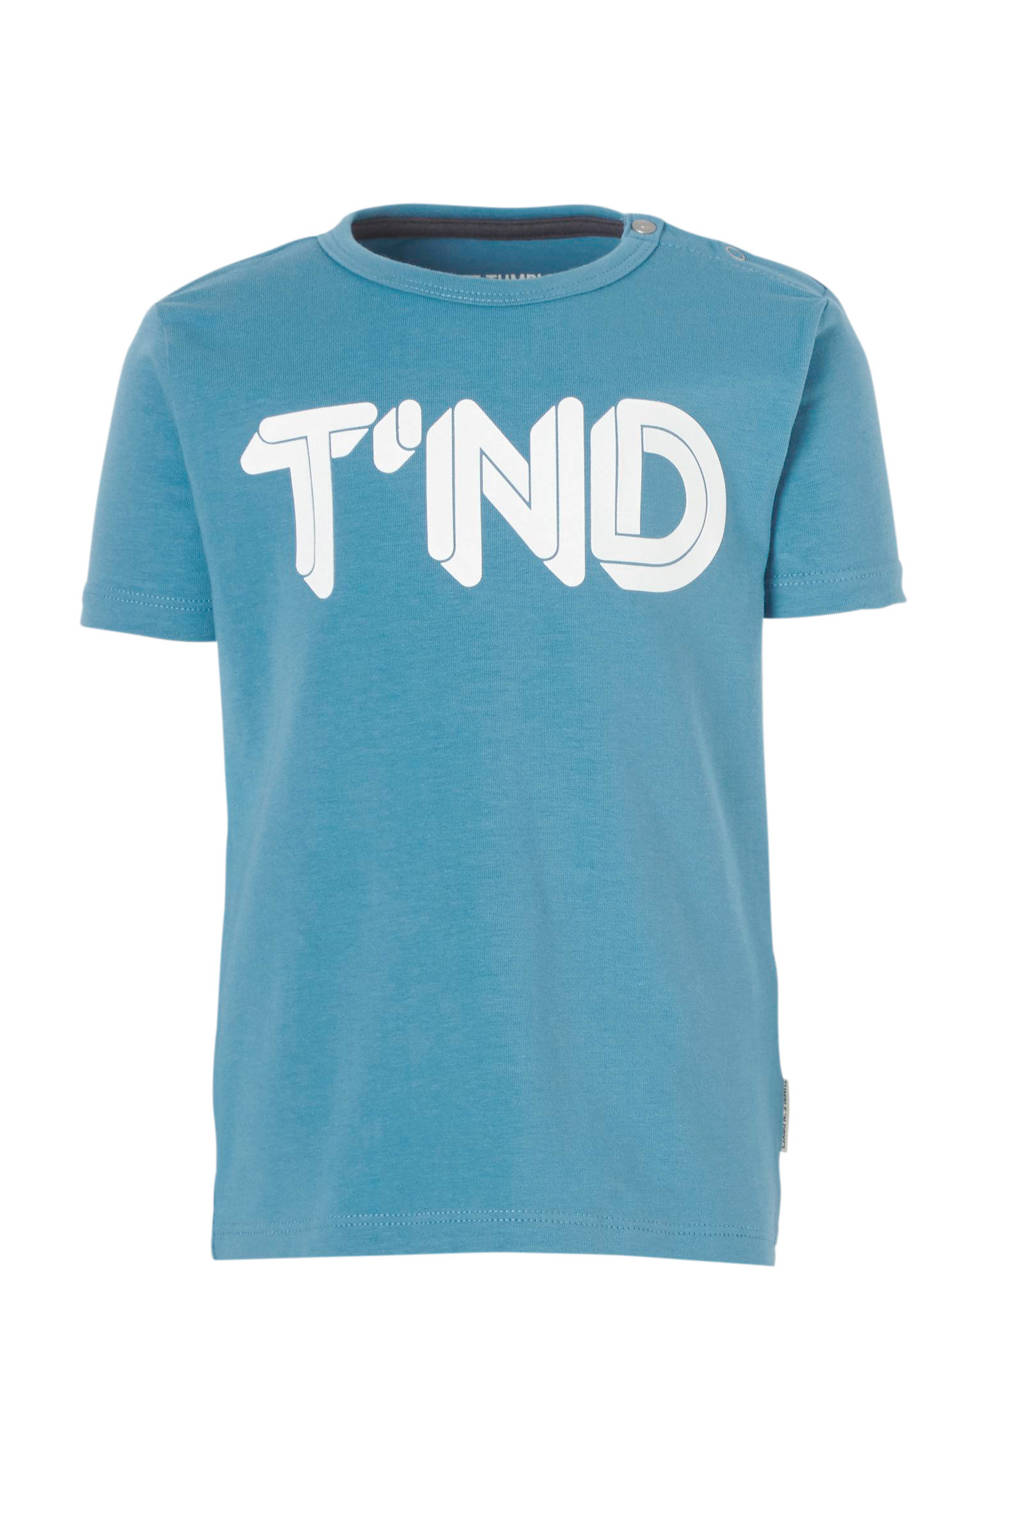 Tumble 'n Dry Lo T-shirt Aquapo met logo blauw, Blauw